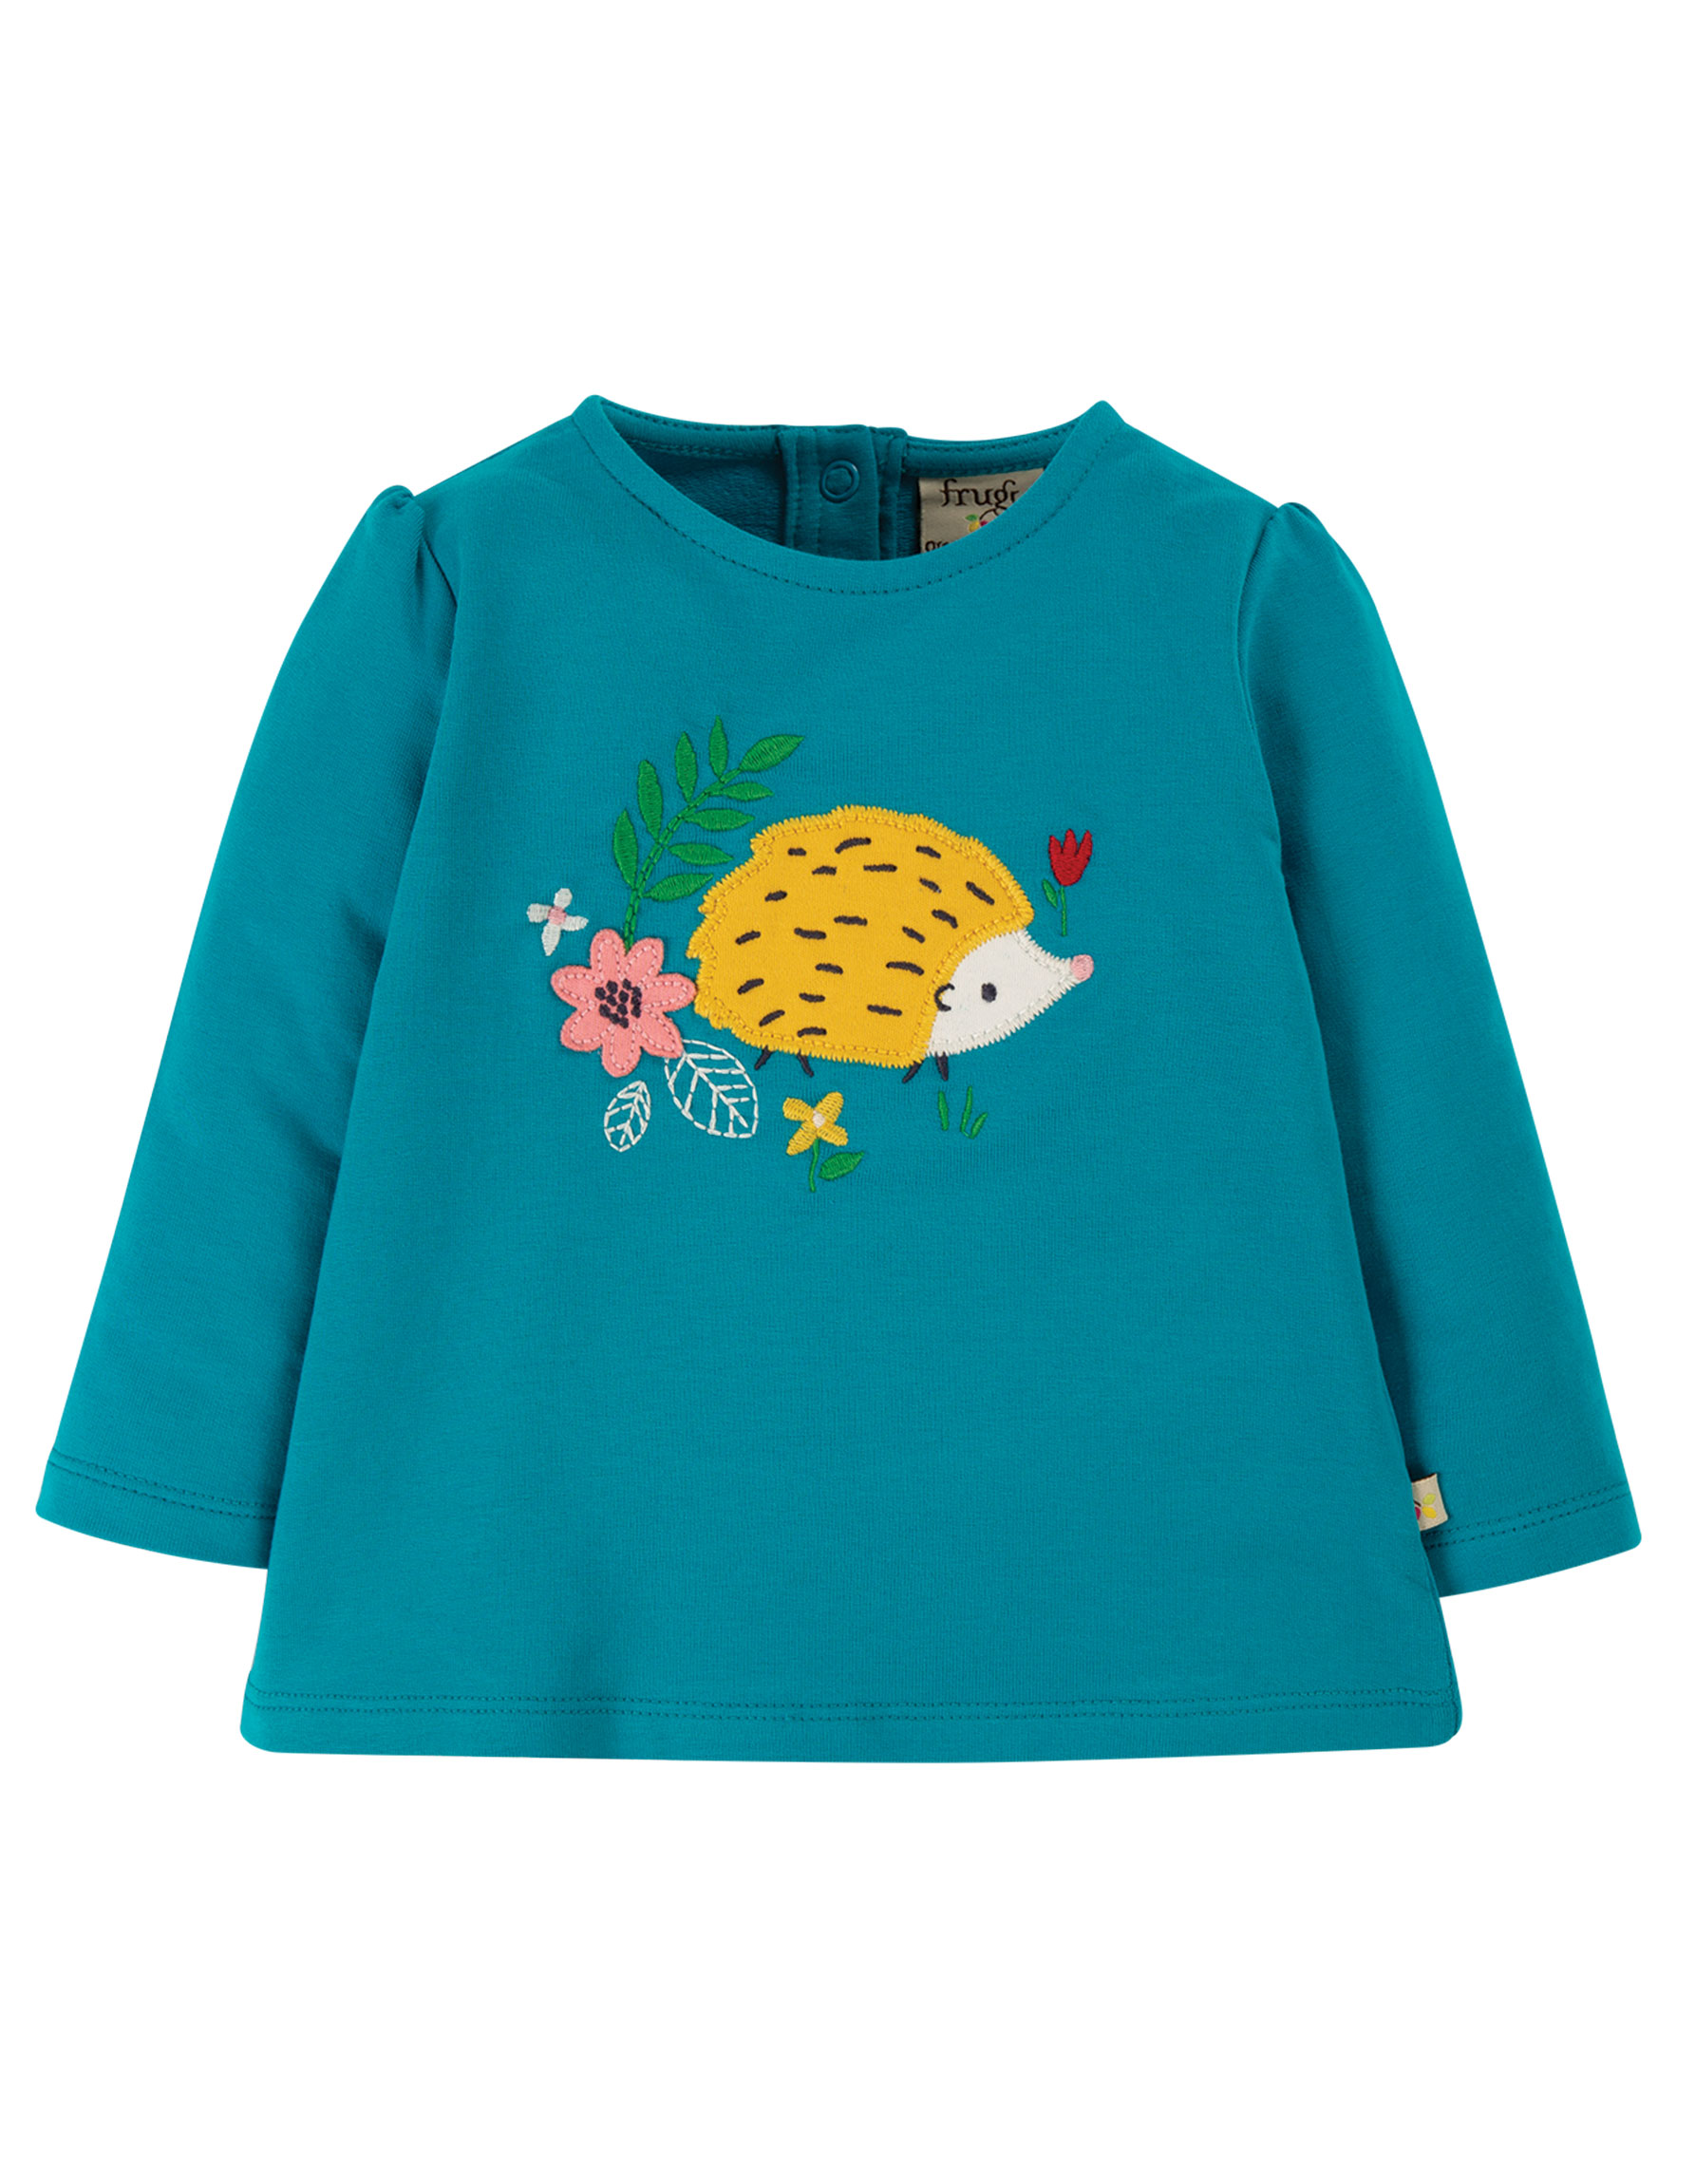 Frugi Little Alana Appliqué Top, Tobermory Teal/Hedgehog